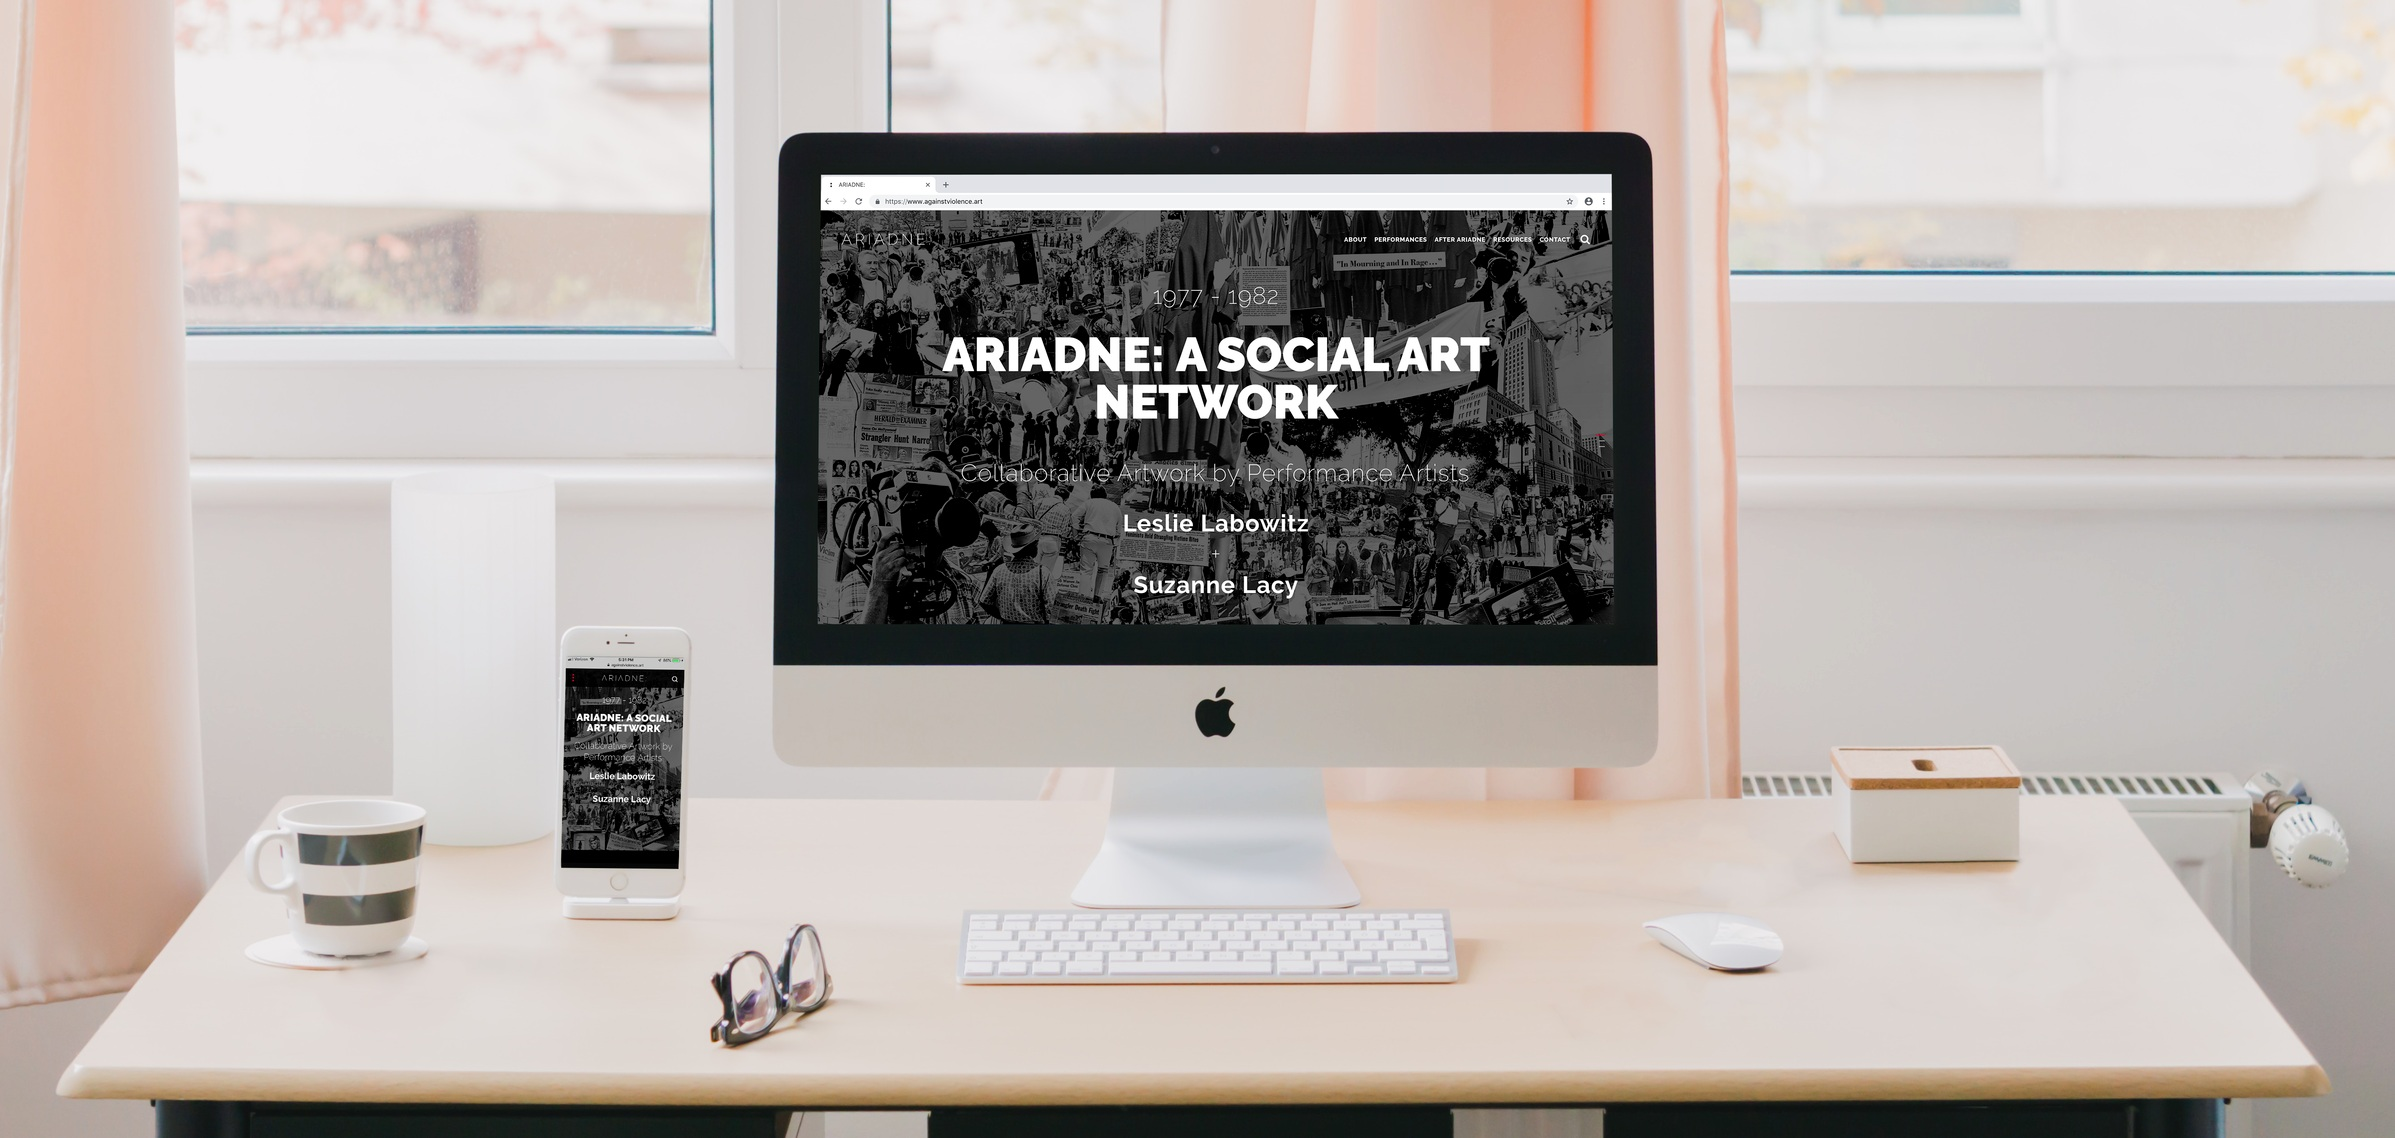 ARIADNE_CoverImagenorbert-levajsics-243763-unsplash+2.jpg